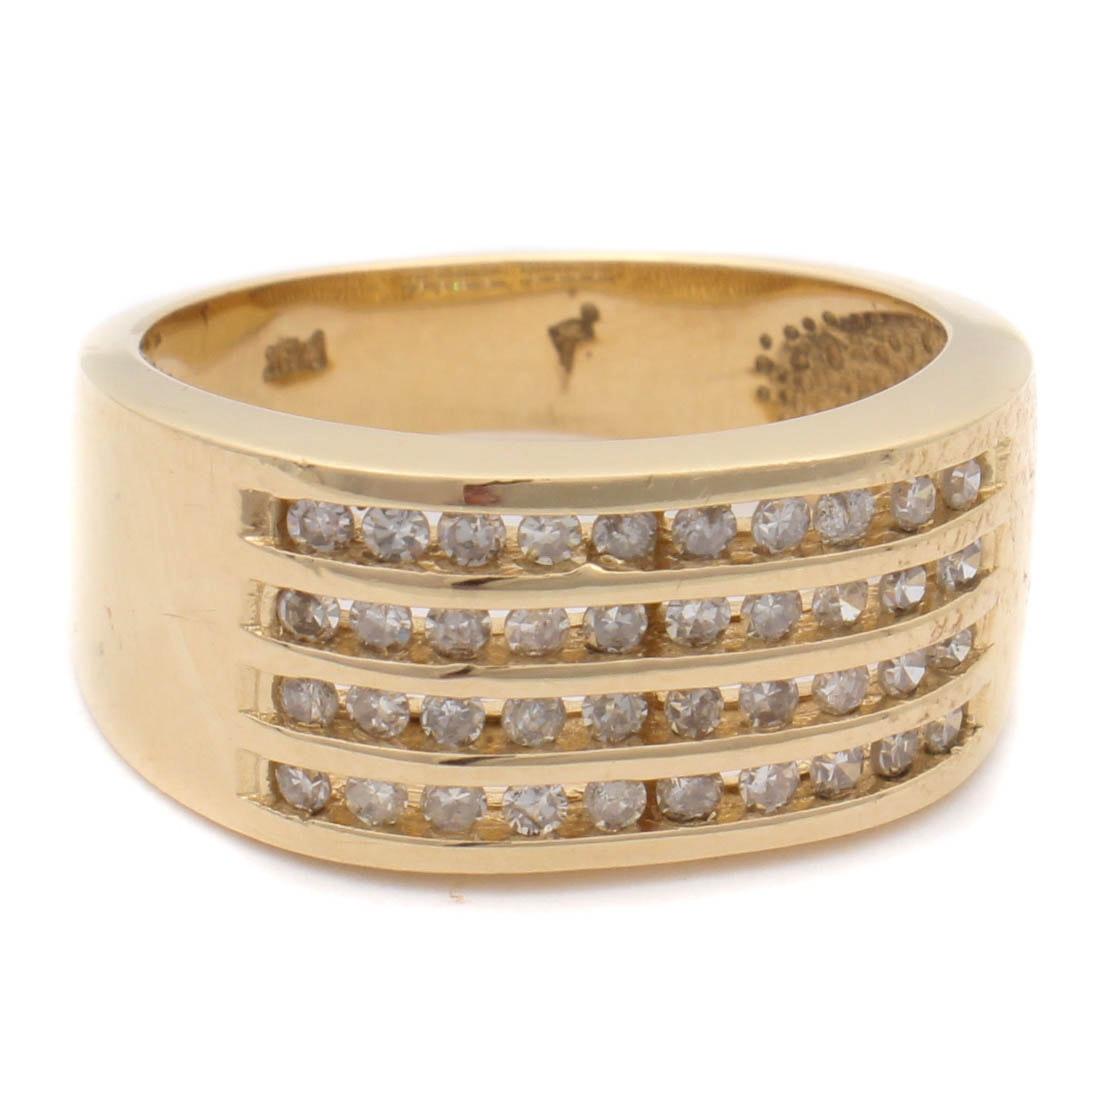 14K Yellow Gold and Diamond Multi-Row Ring